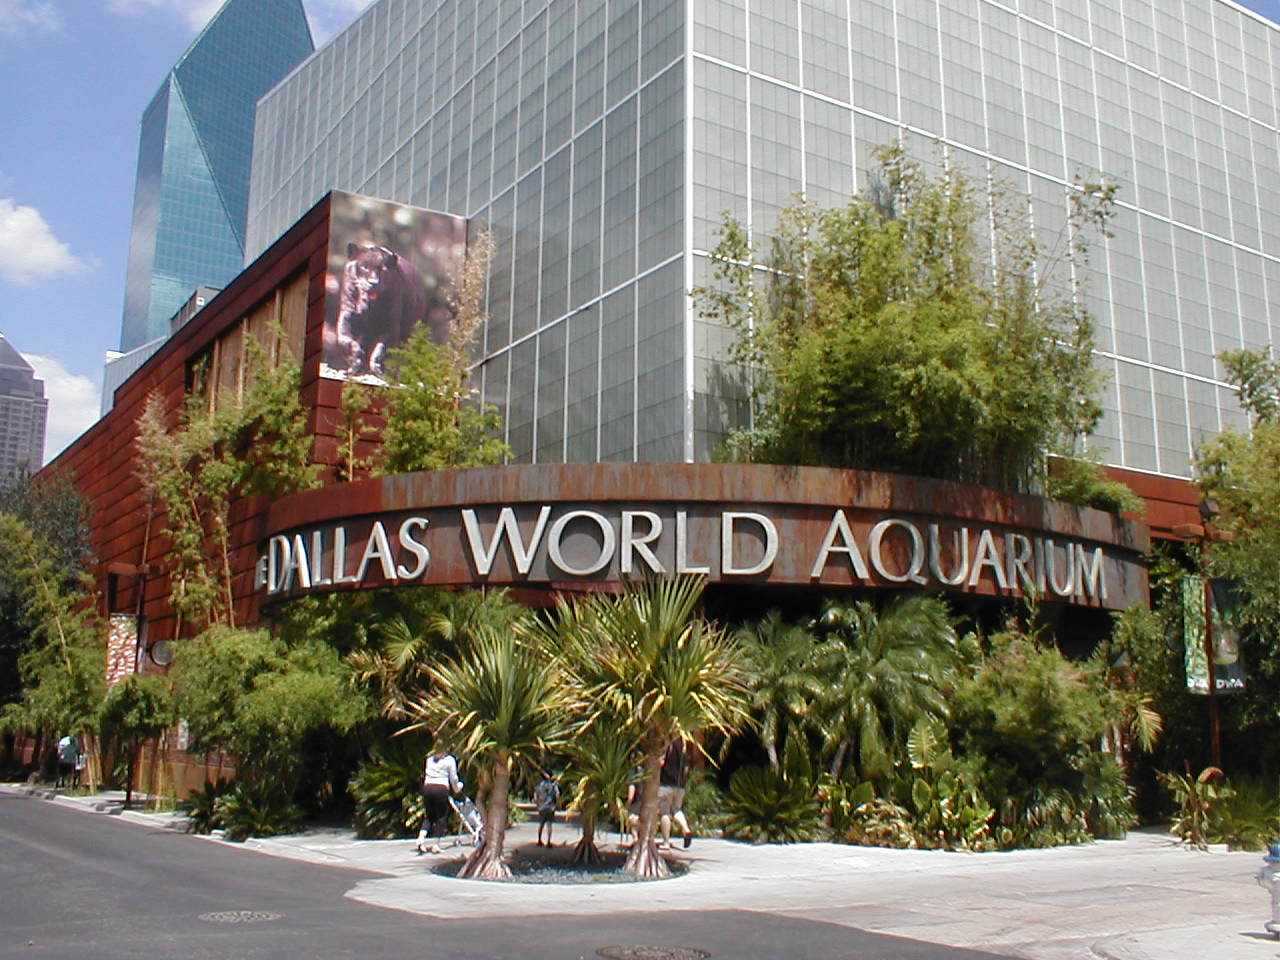 Beautiful Place to Visit In Dallas City-Dallas World Aquarium